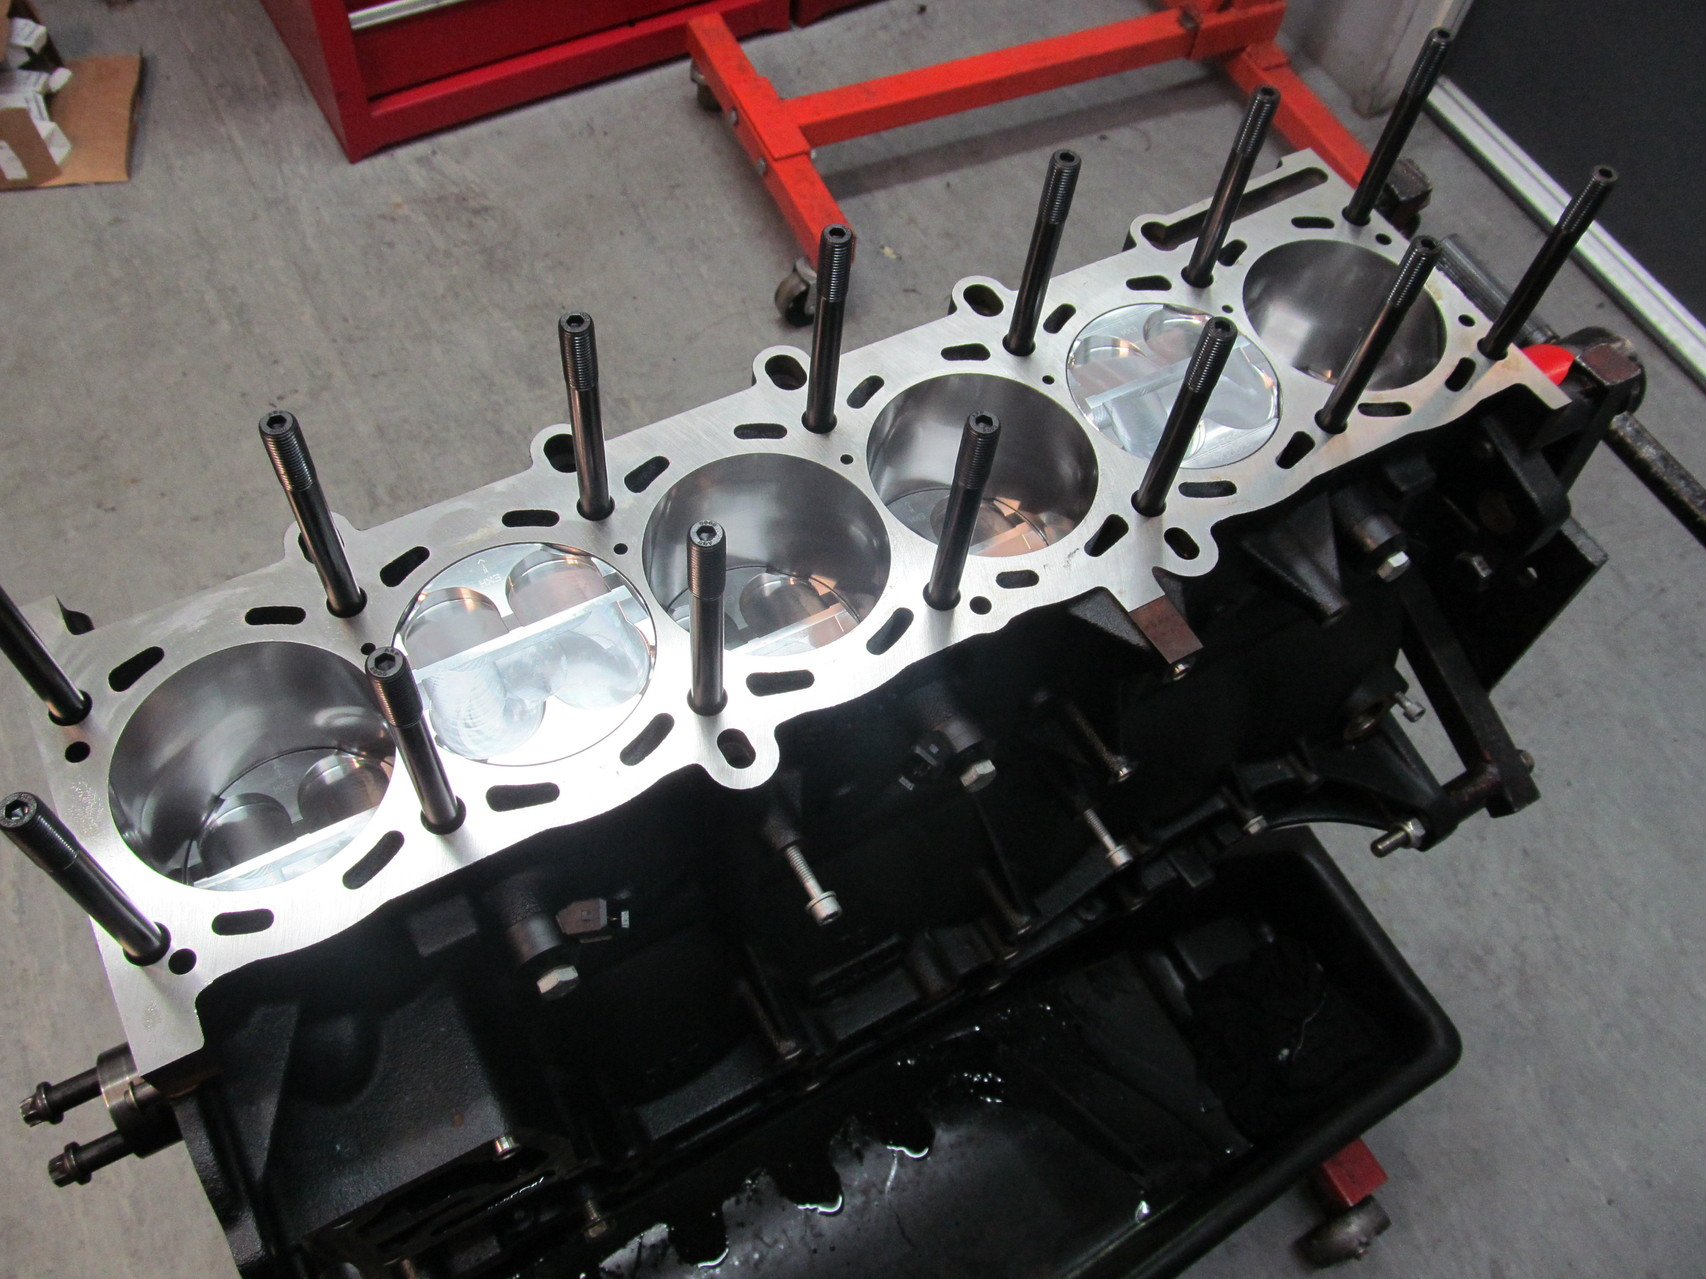 BMW S54 Race engine prep